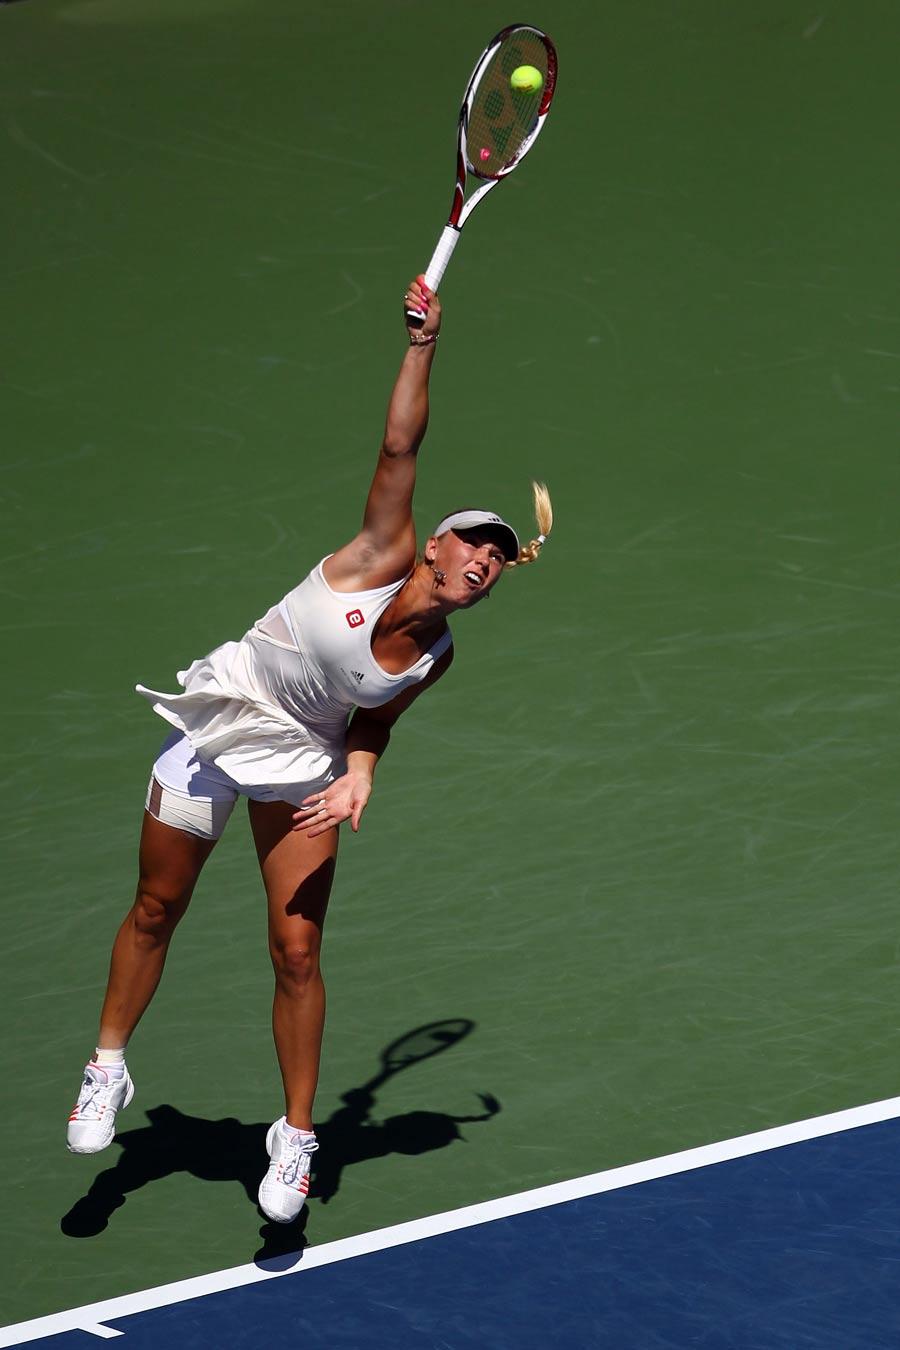 28511 - Commanding start from Wozniacki